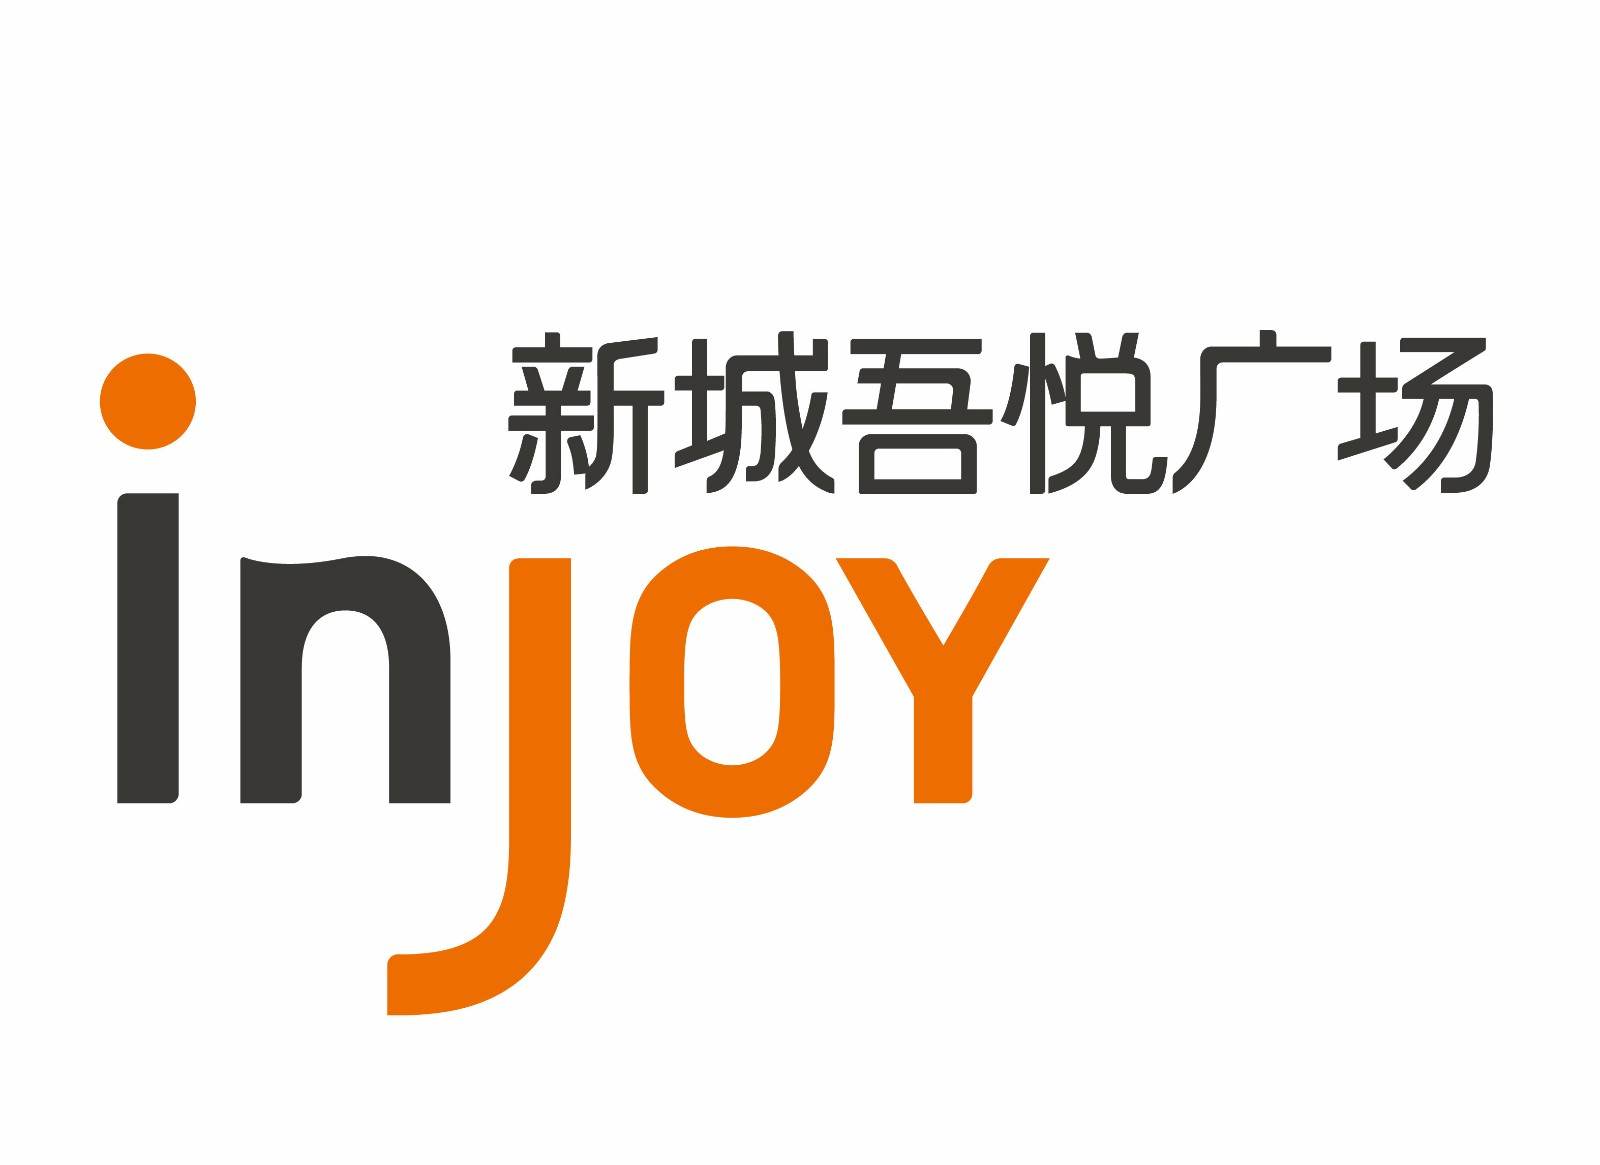 玄鹤新城logo